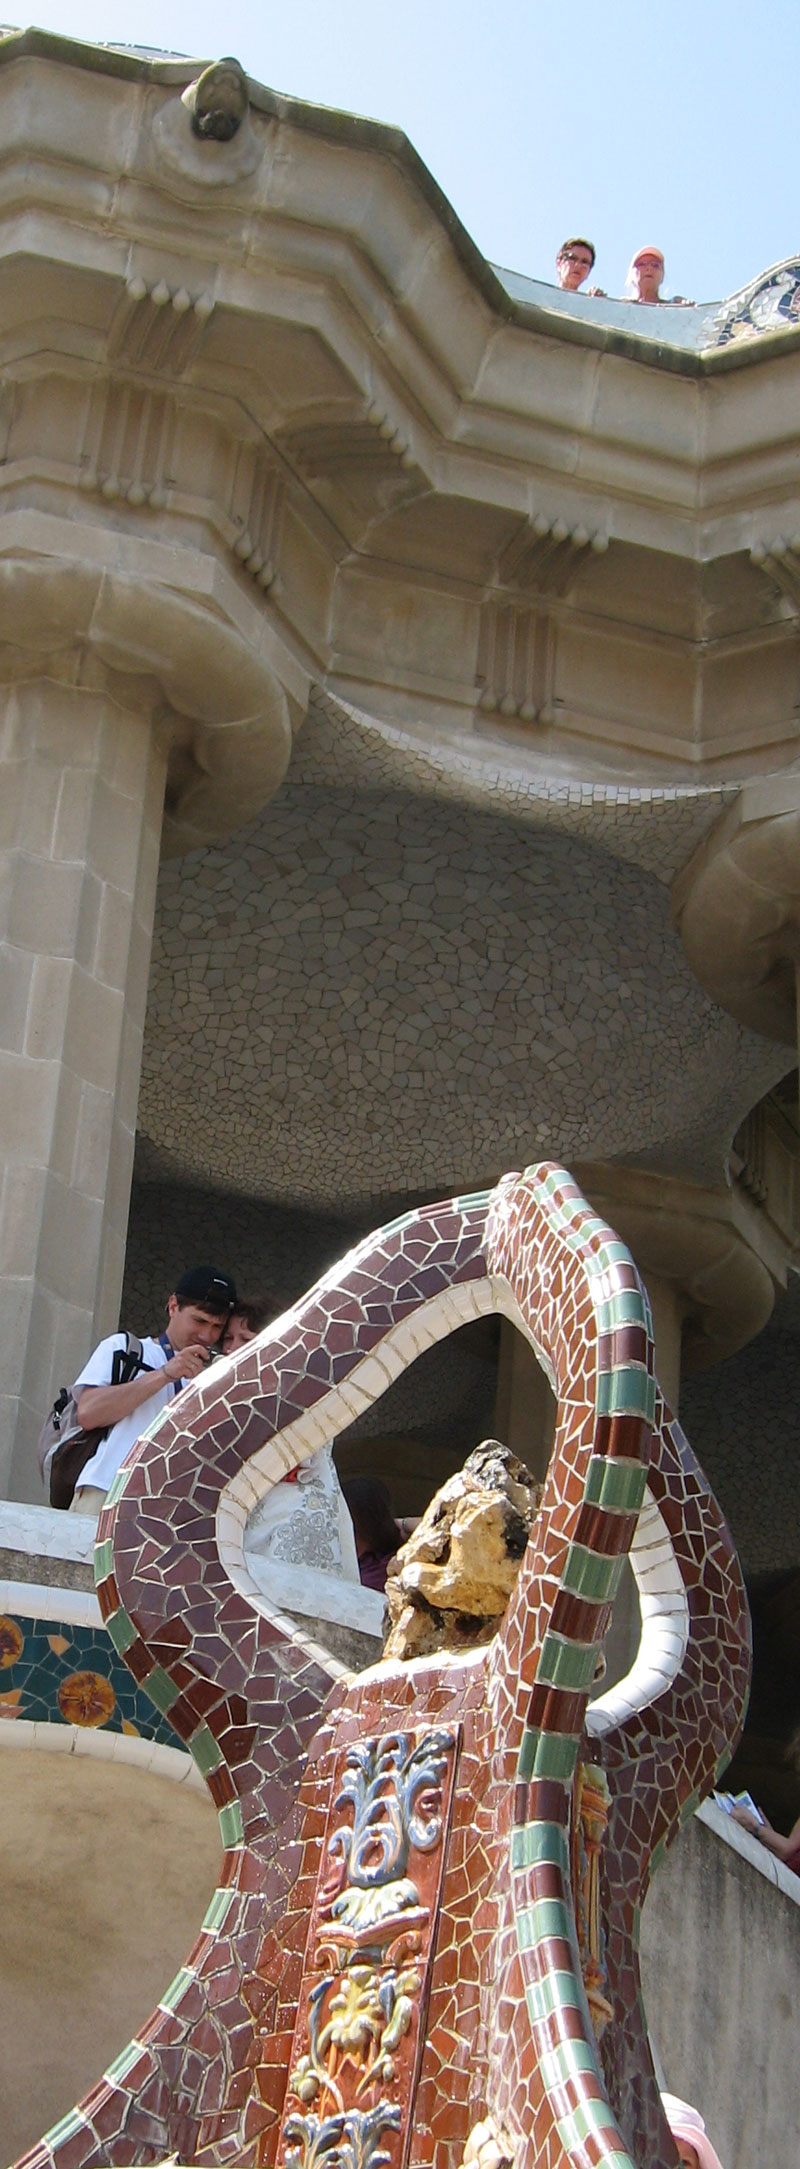 Gaudi Antoni Barcelona Spain Work of Art